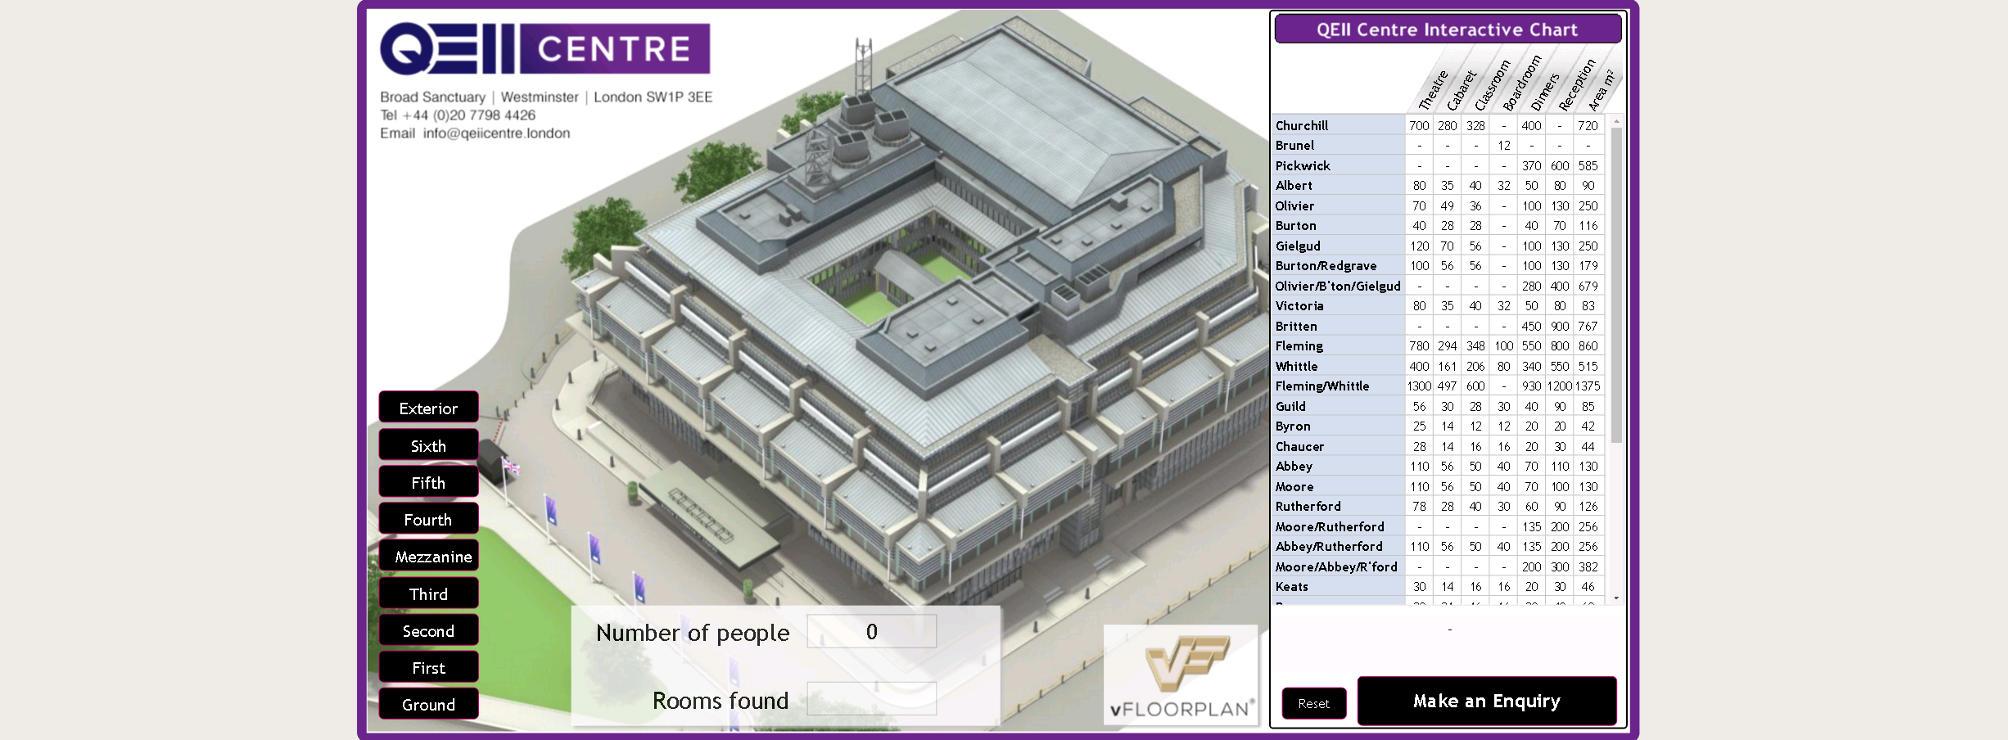 QEII Centre vFloorplan